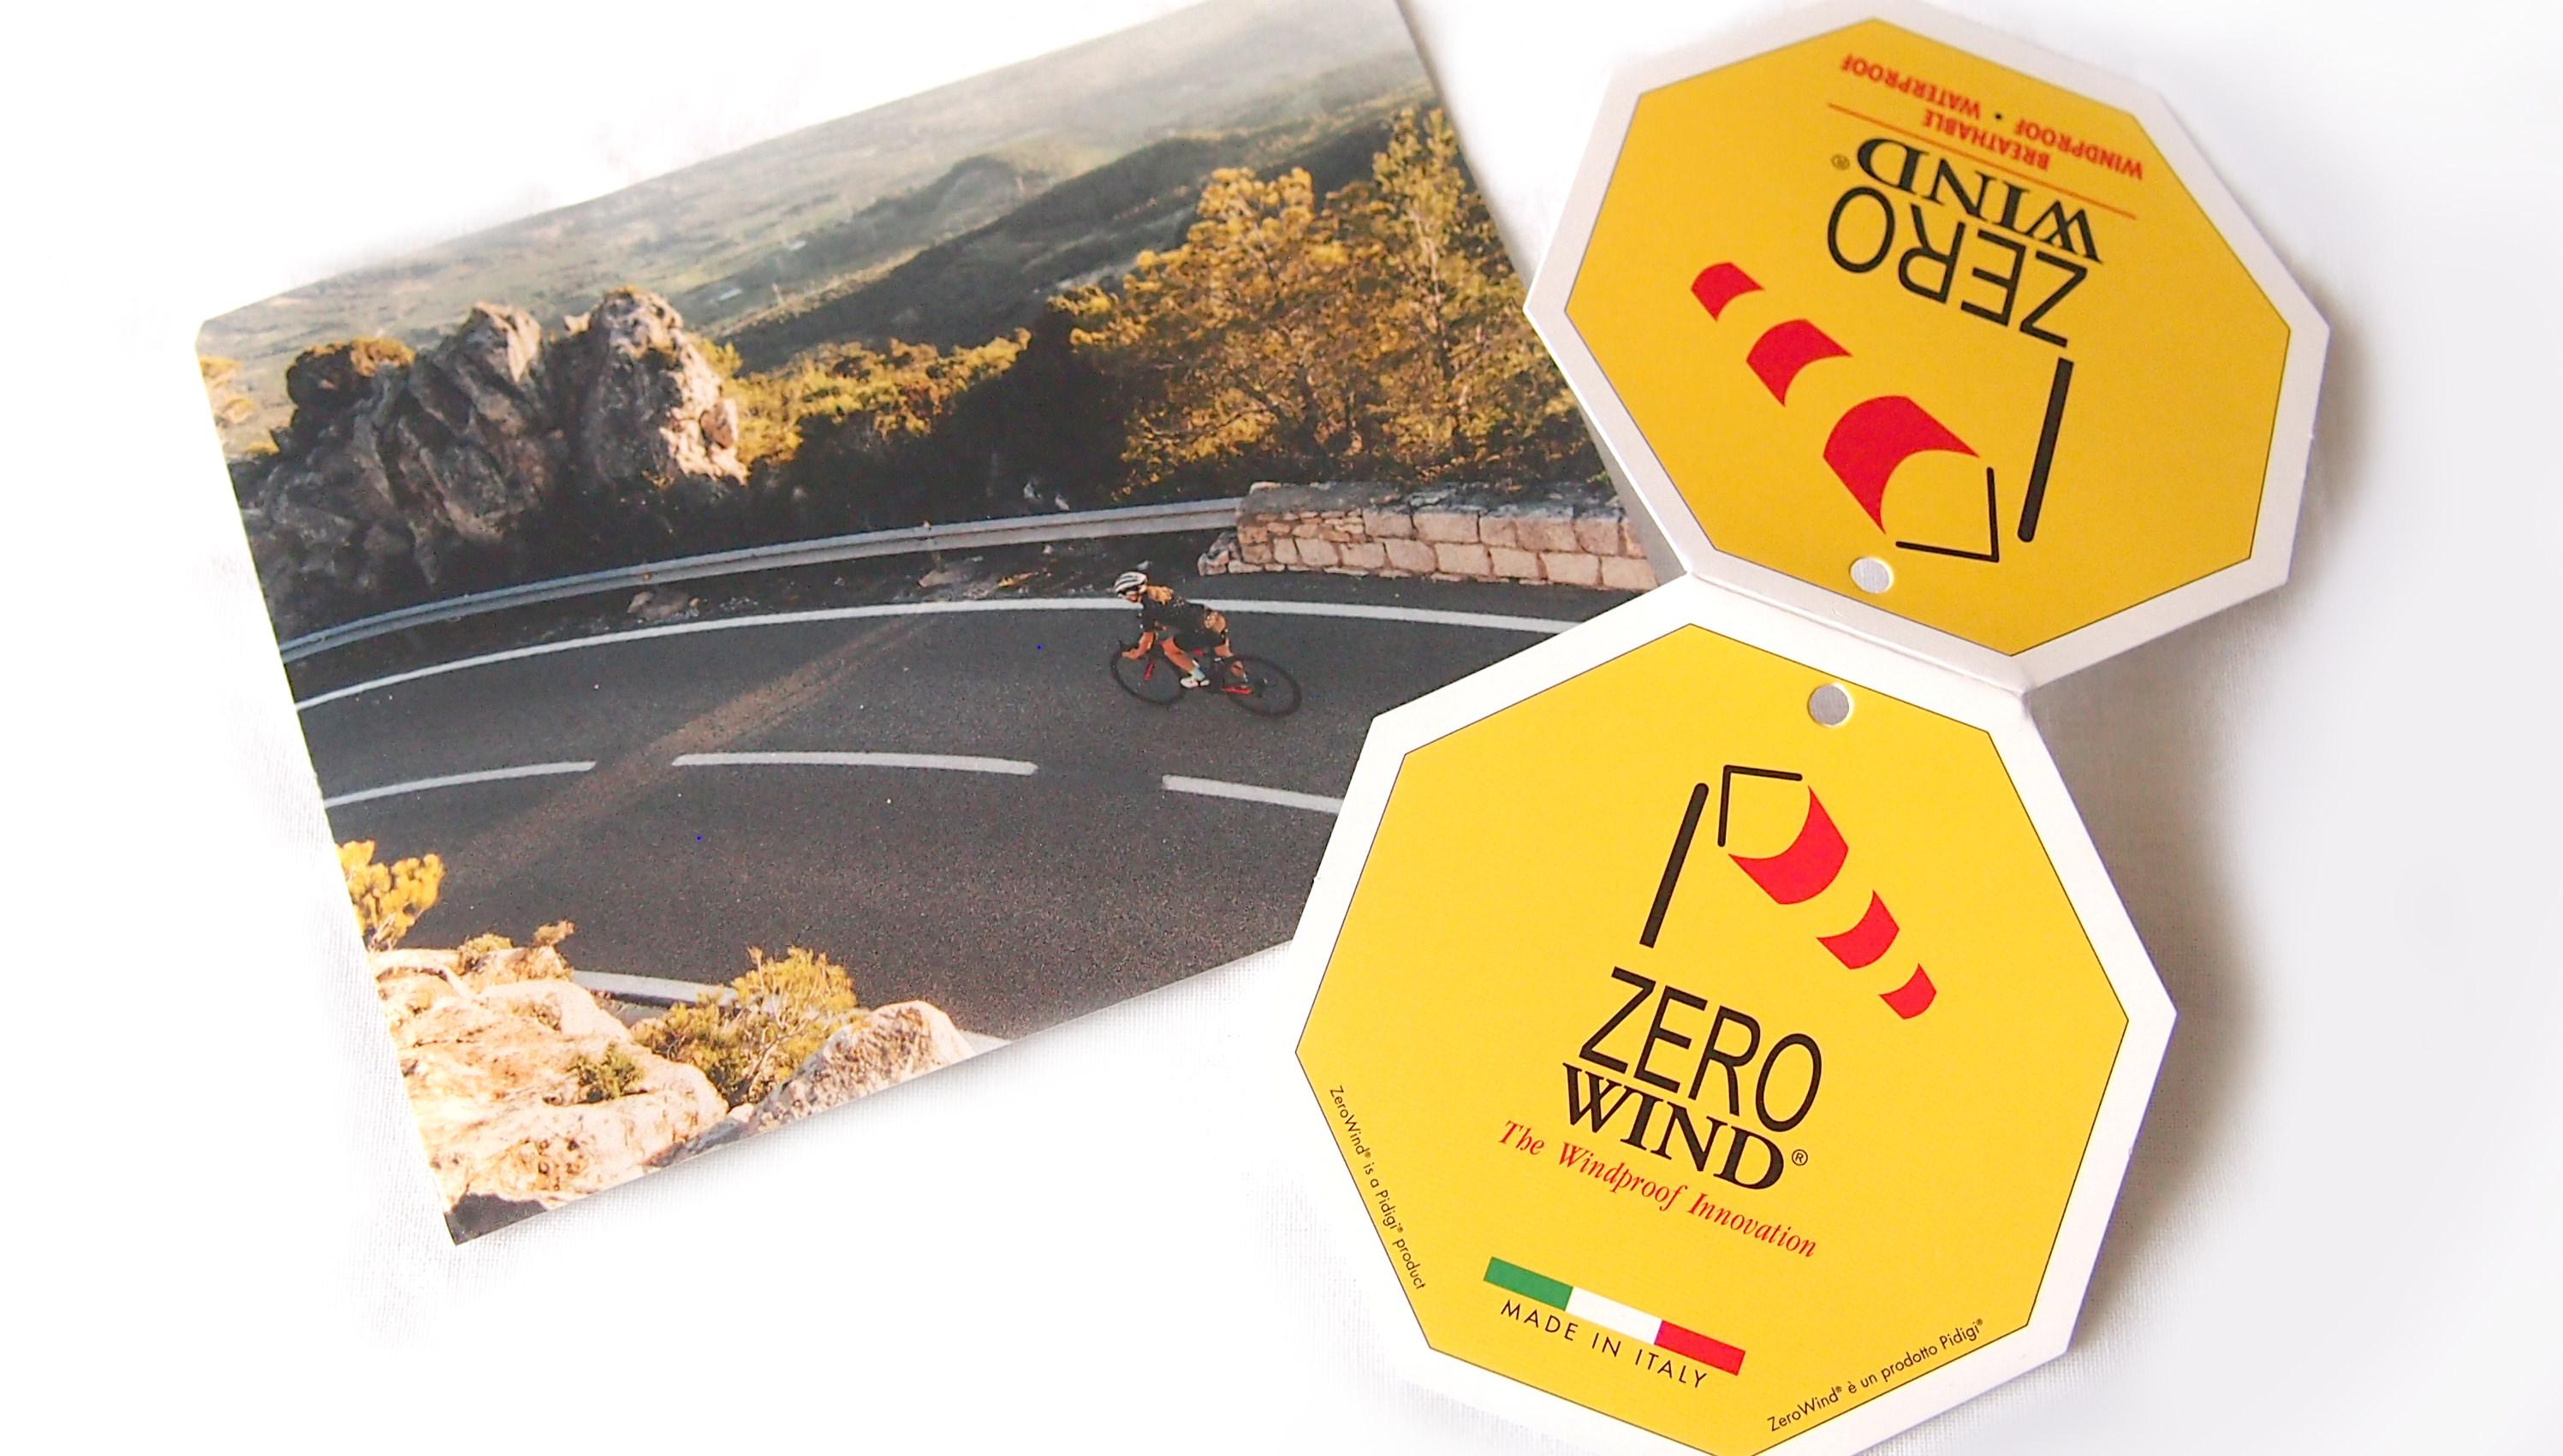 twocirclescycling giletポストカード